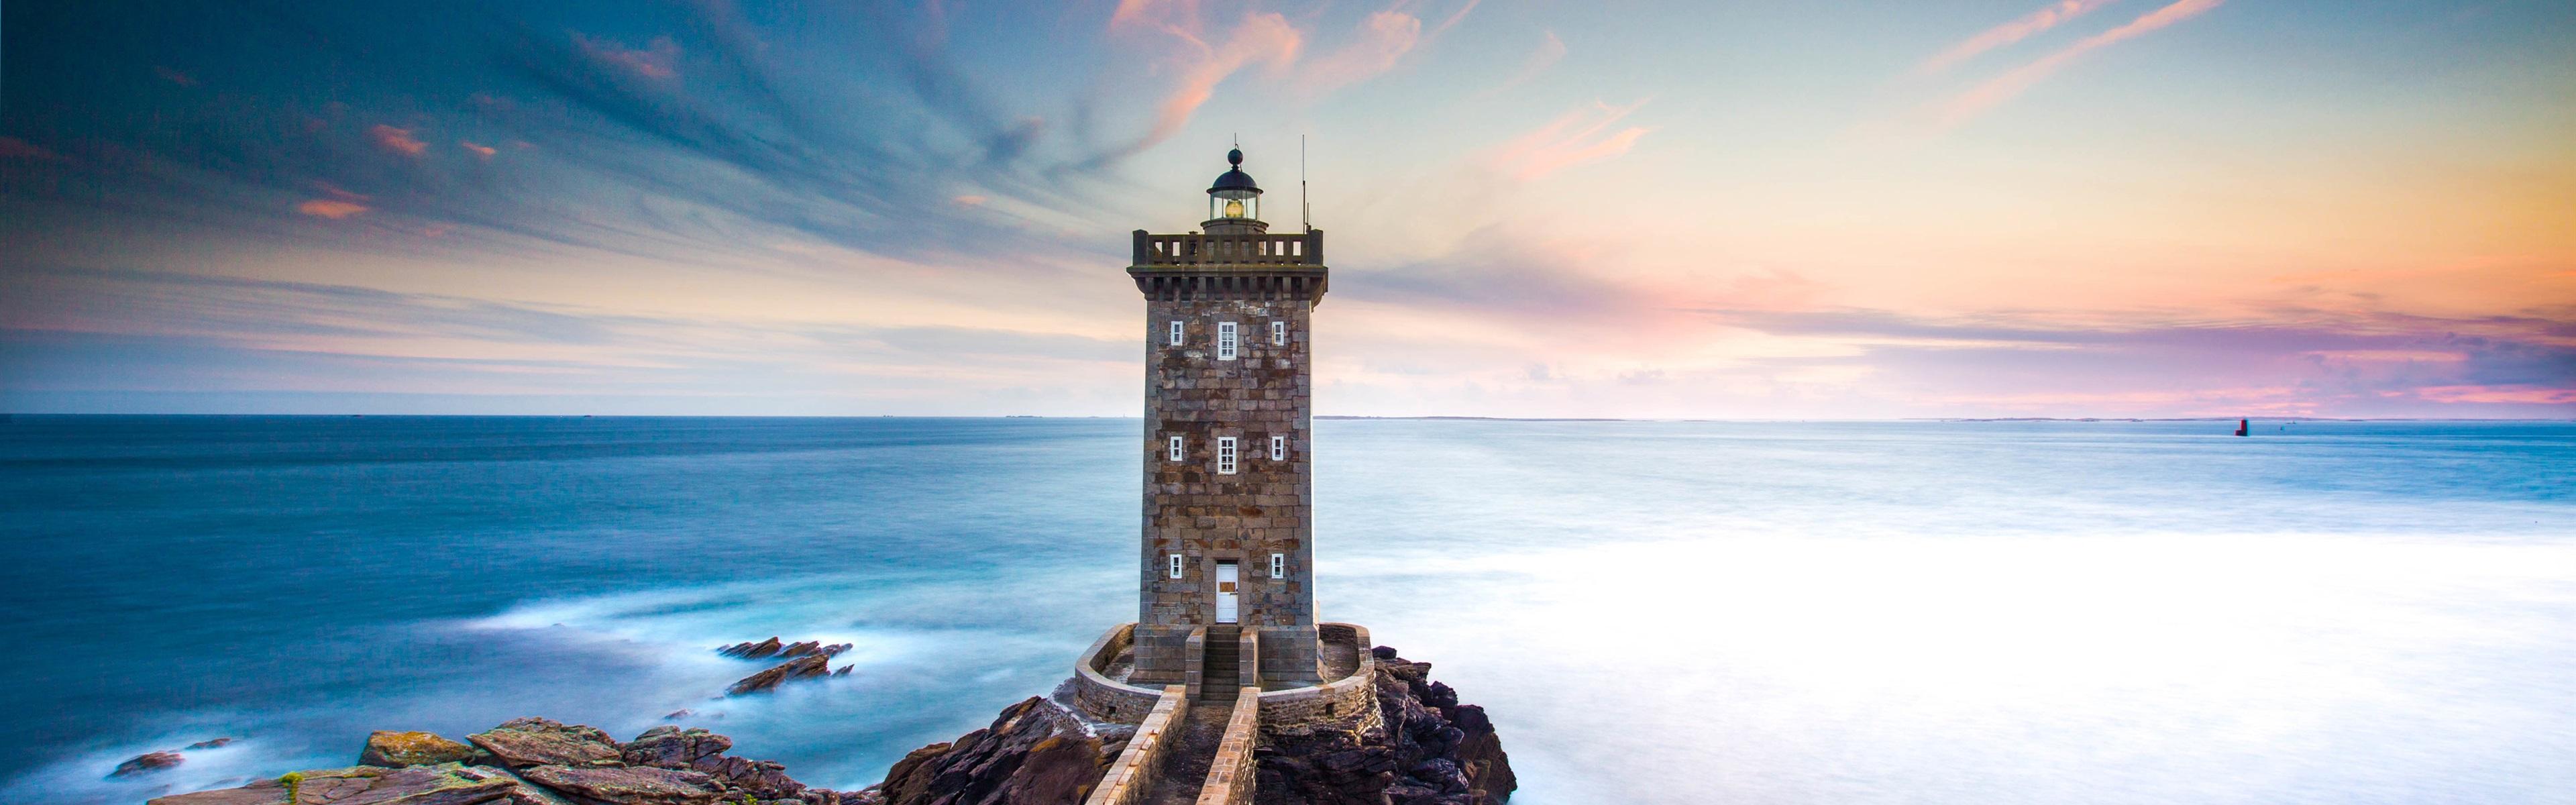 France Kermorvan Lighthouse Sea Coast Dusk Wallpaper